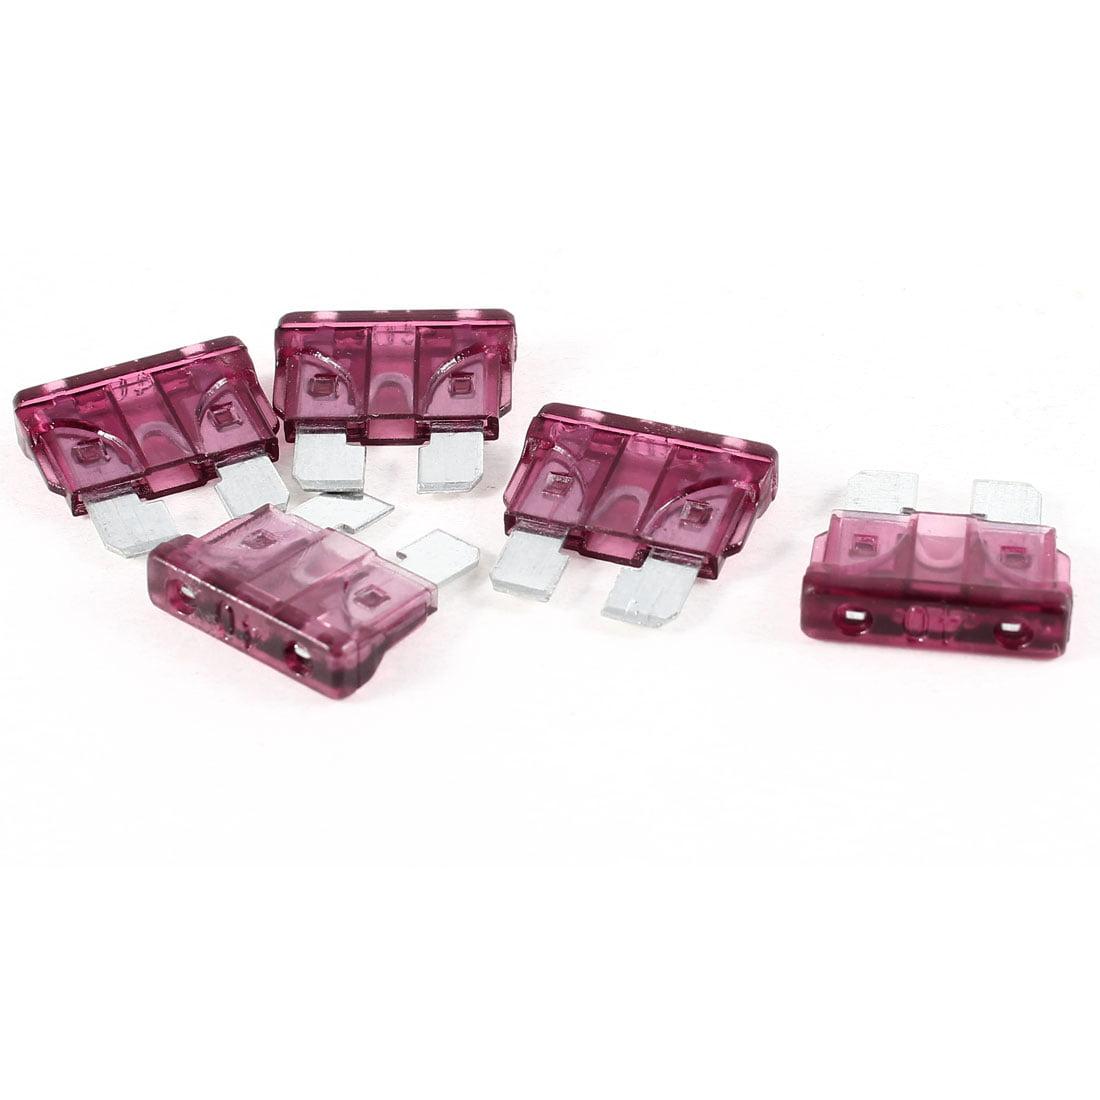 5pcs 40A Automotive Car Auto Purple Plastic Coated   Fuses